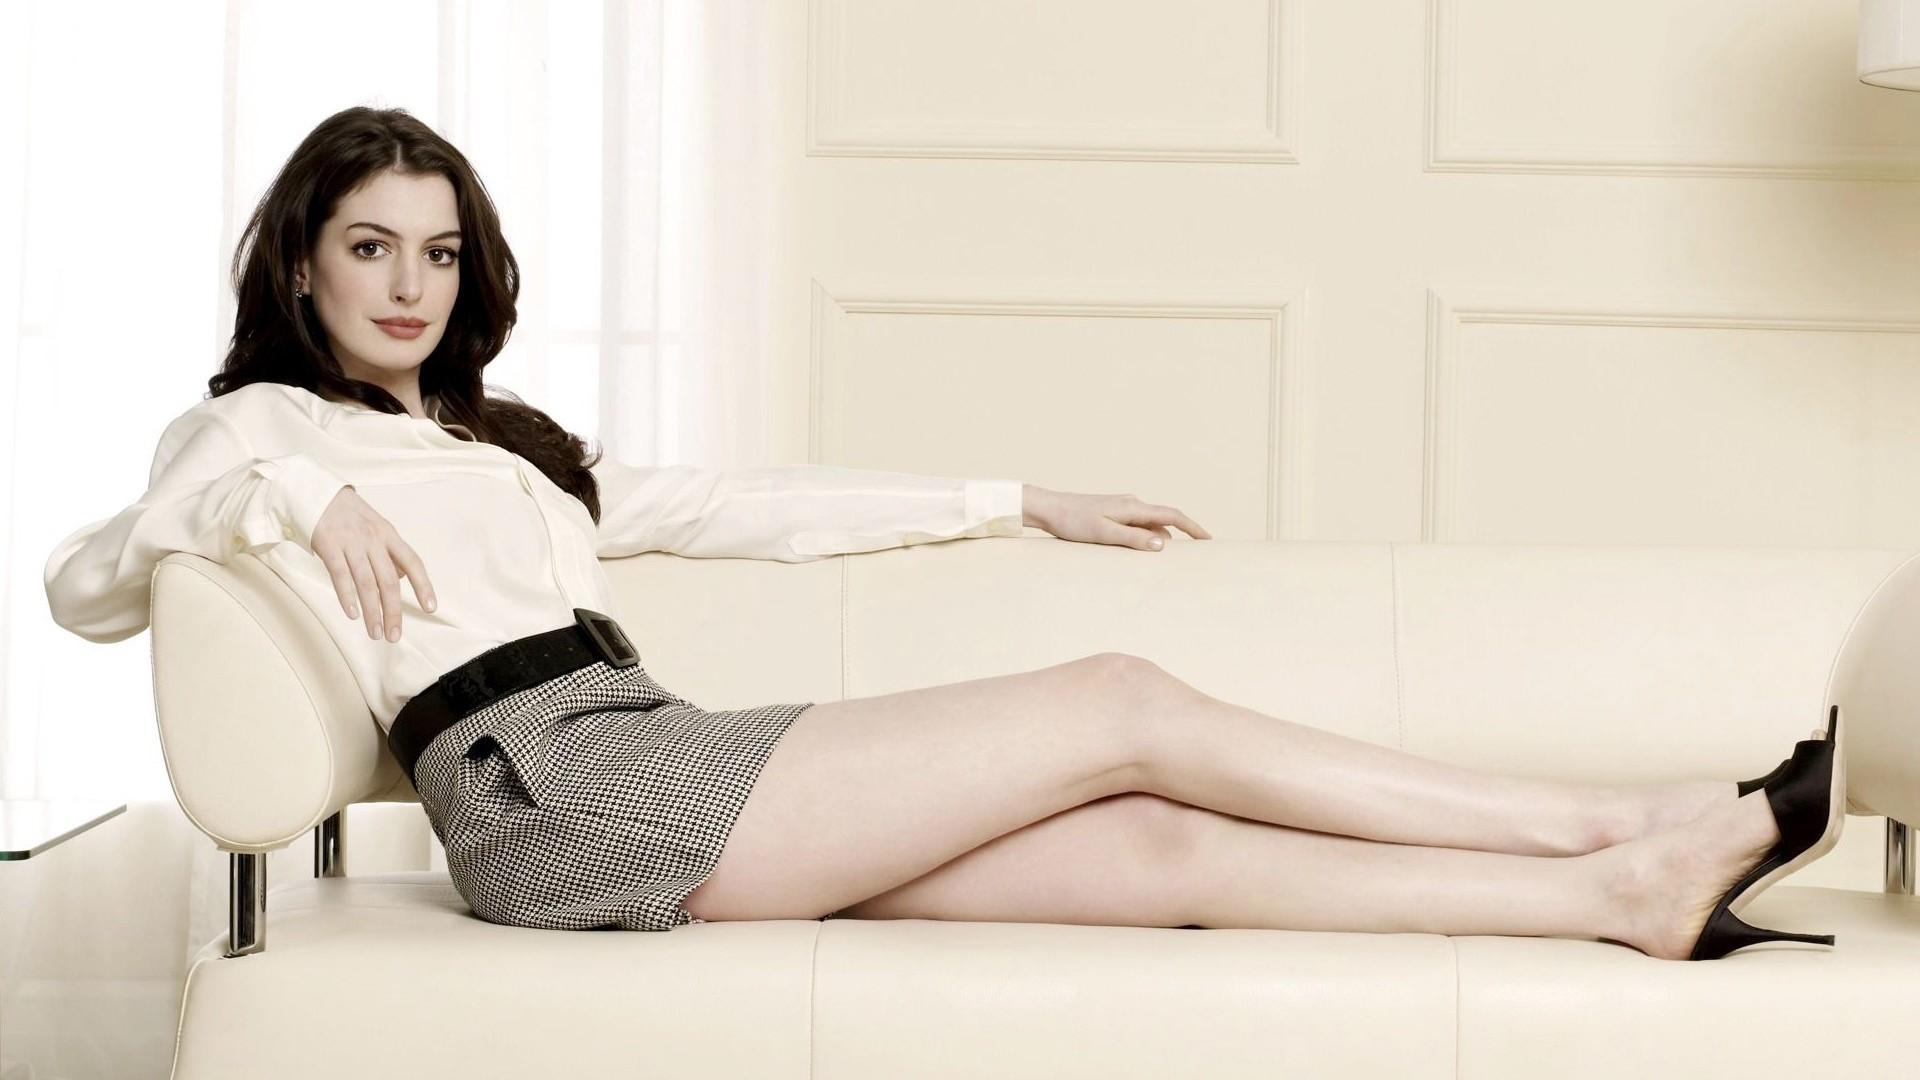 Anne Hathaway For Desktop